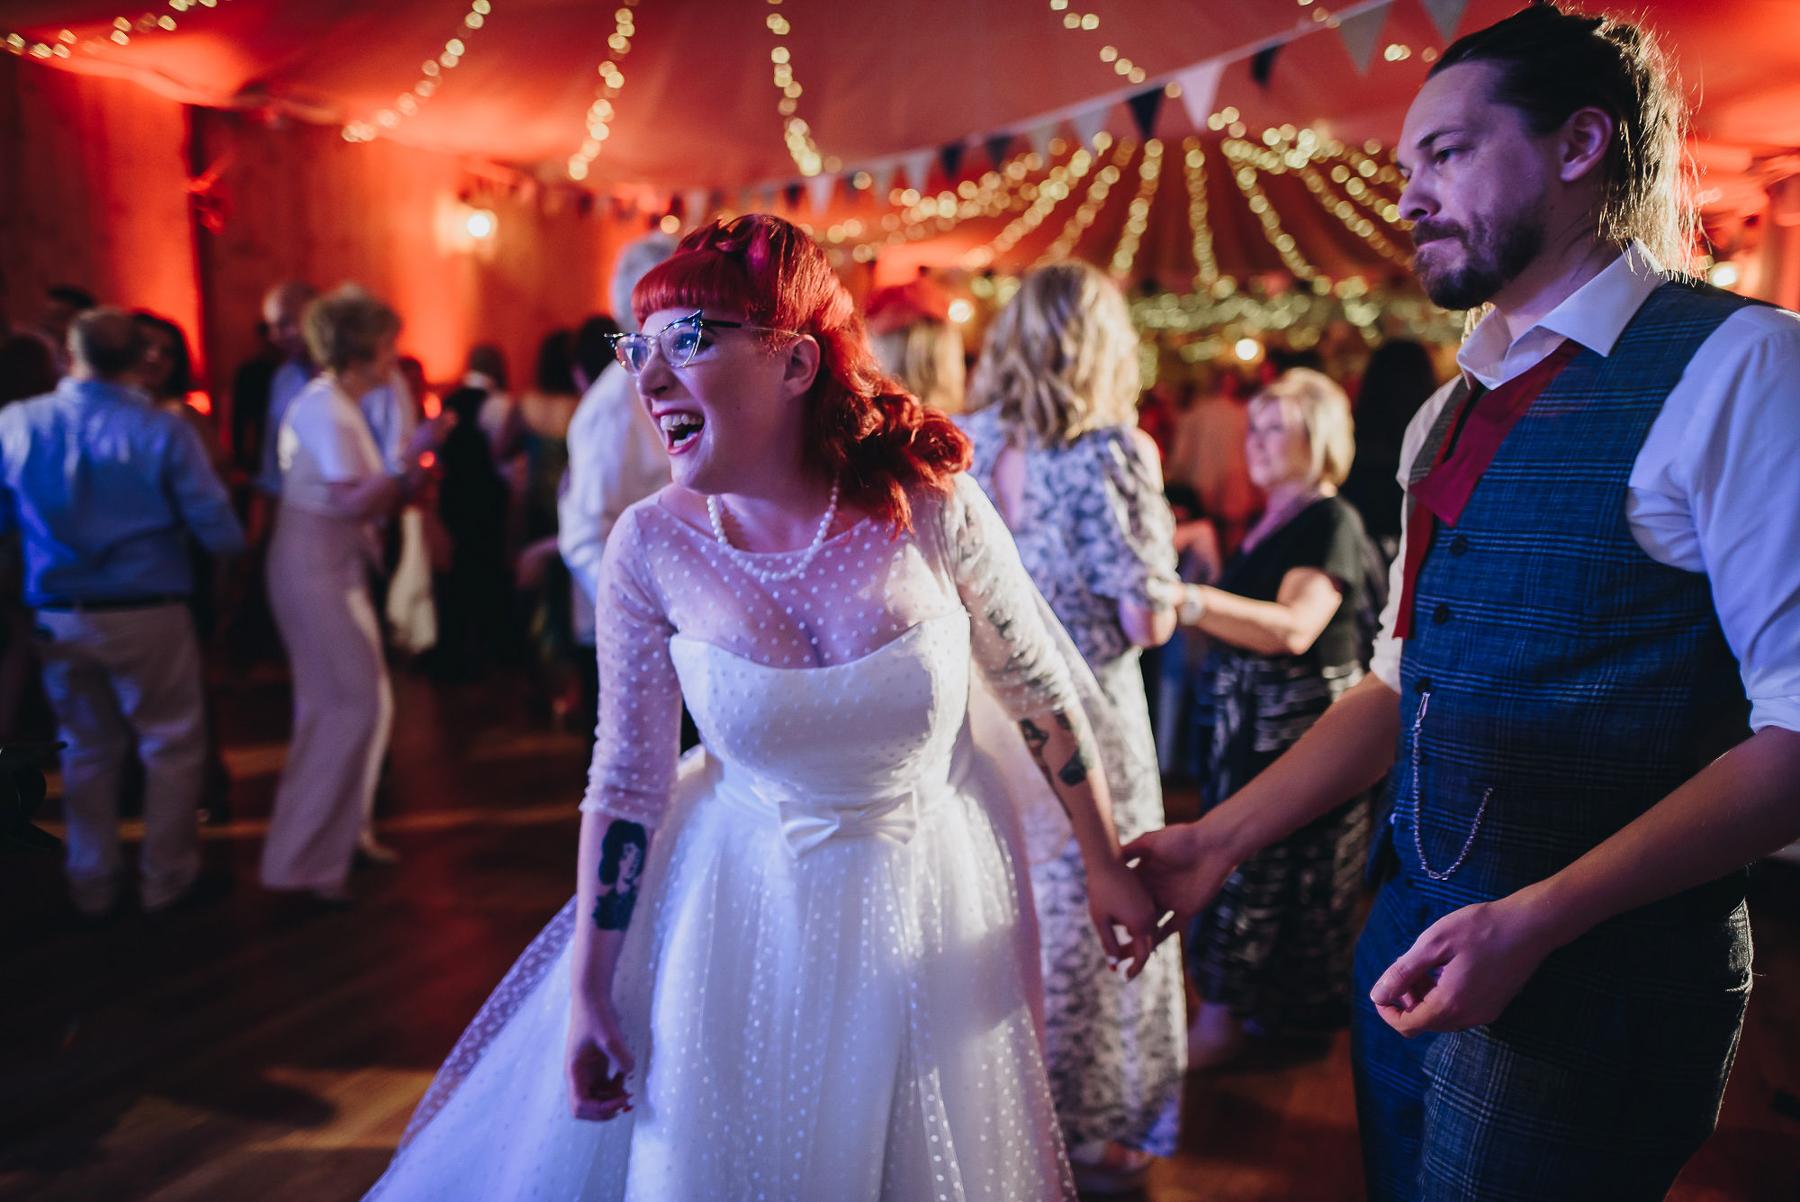 Wellbeing_Farm_Wedding_Photography_The_Pin-Up_Bride_Lara_Shaun-154.jpg